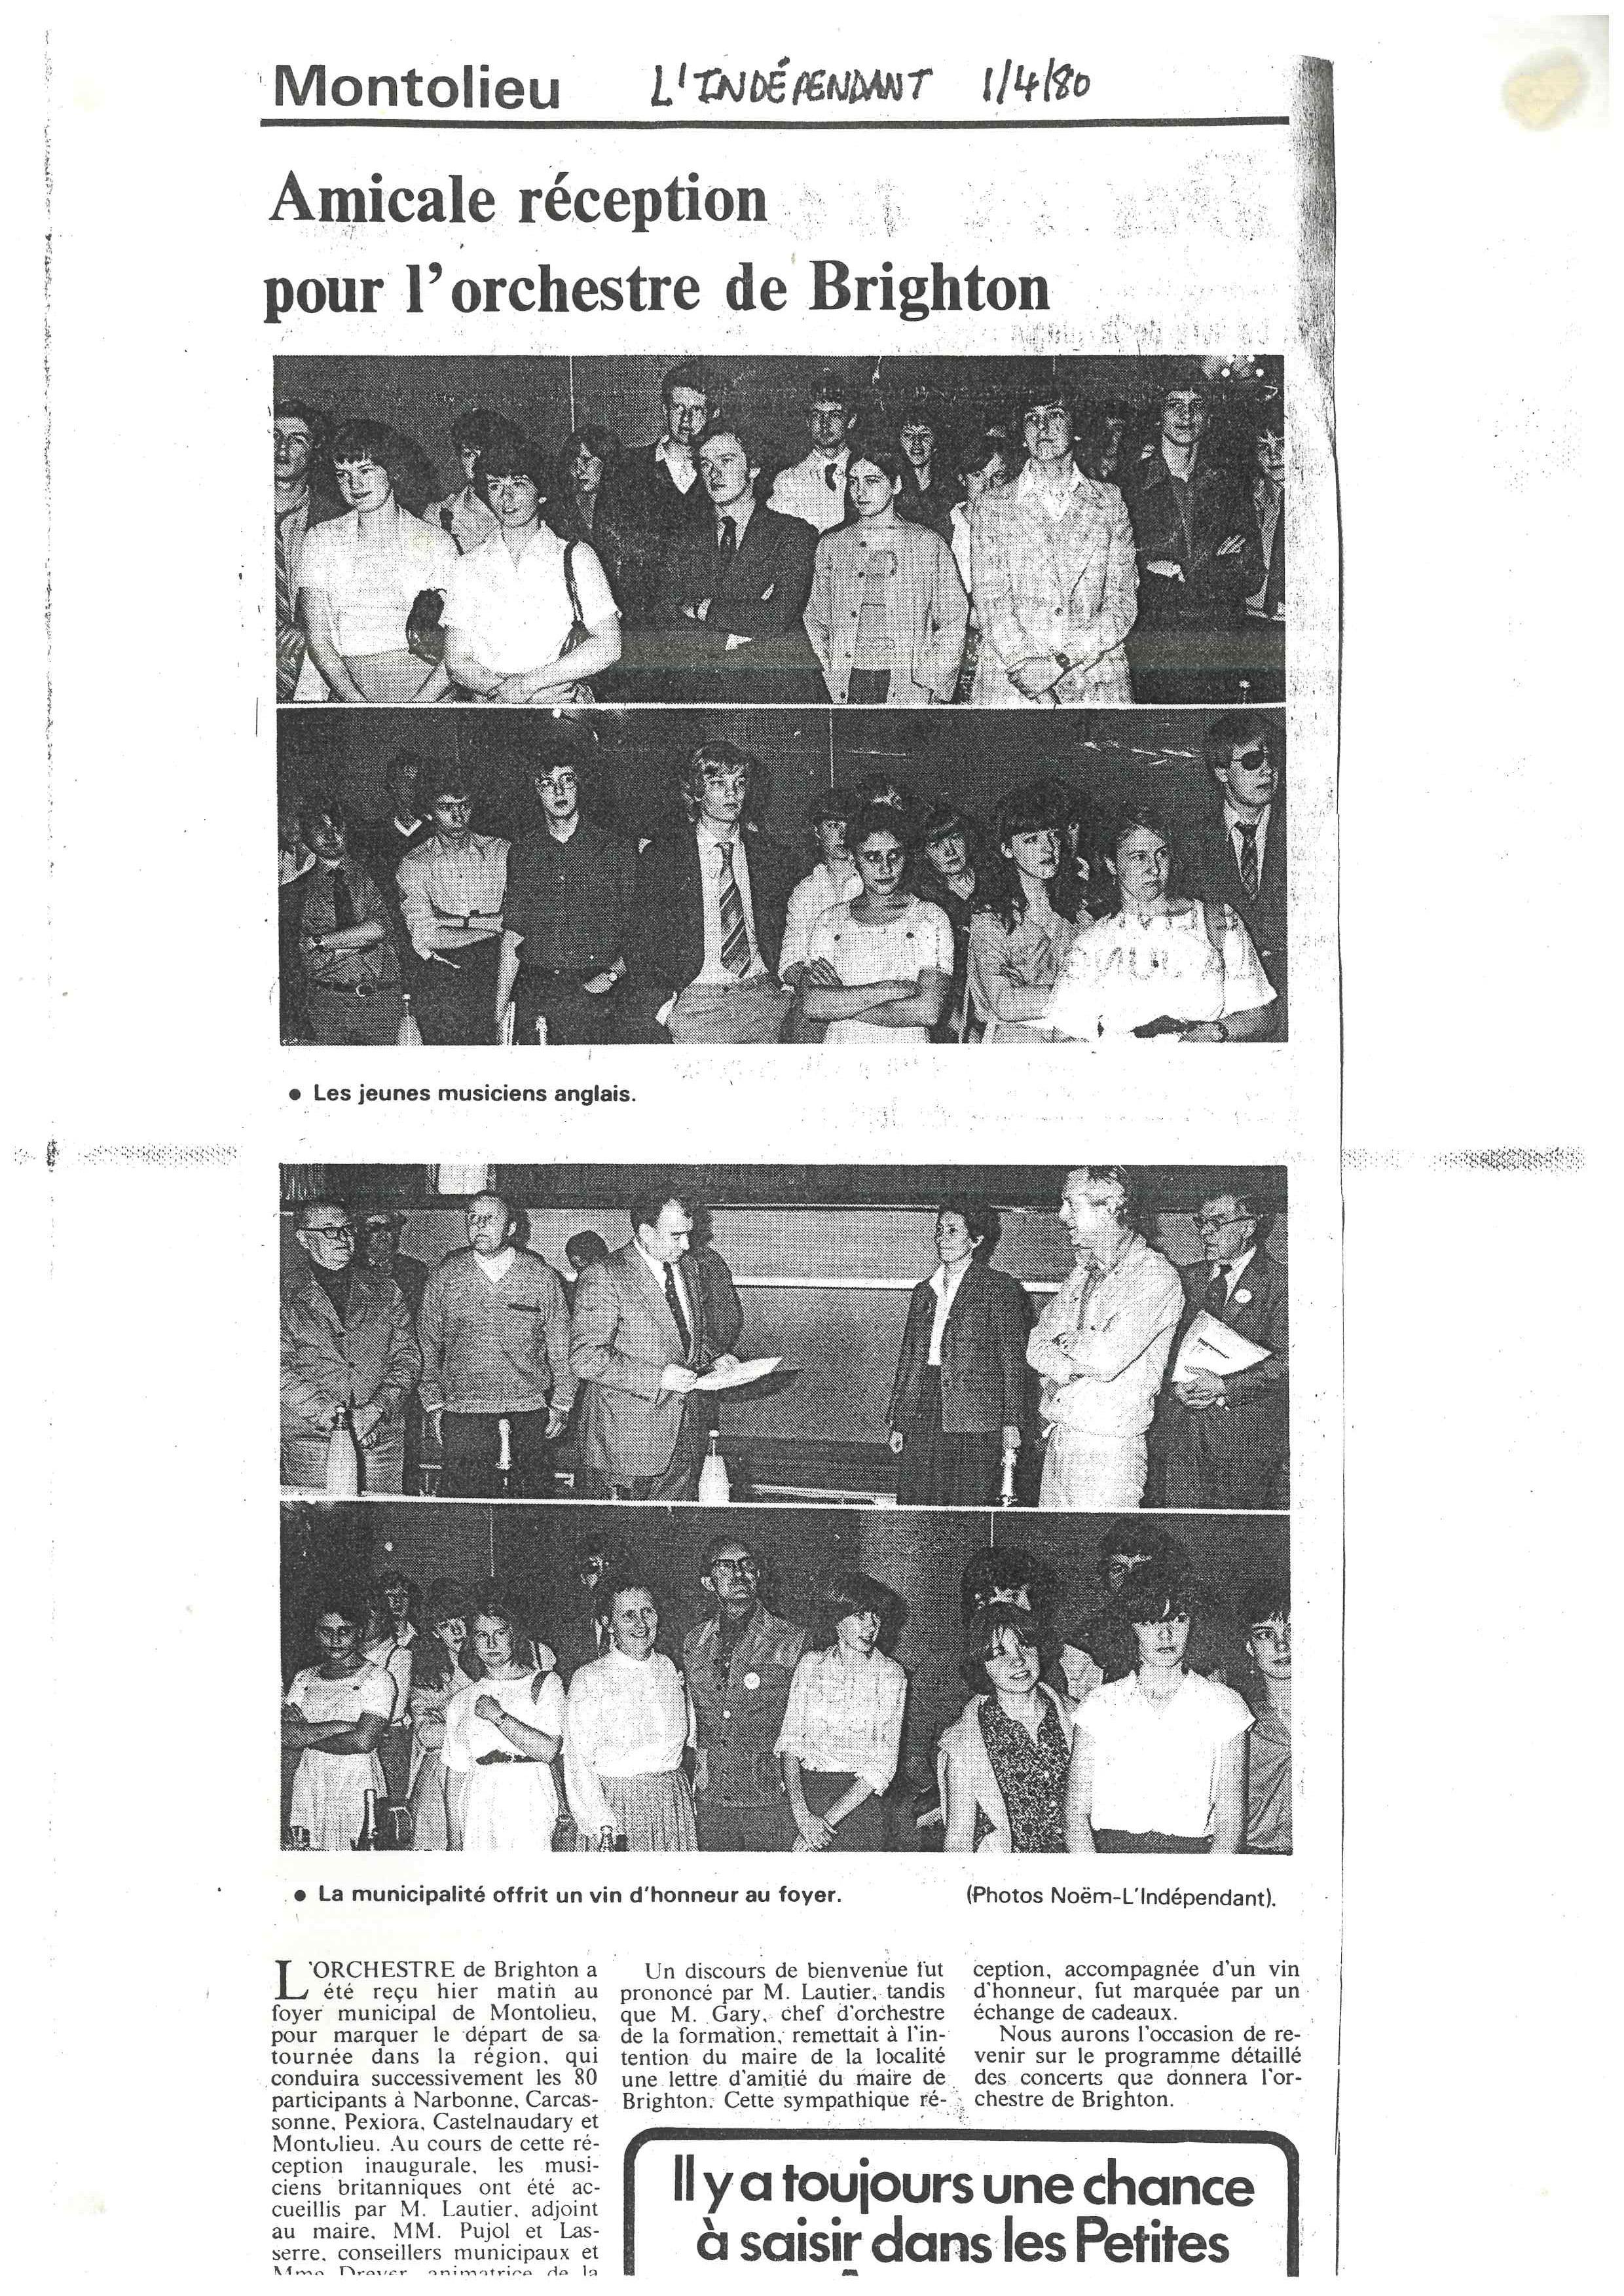 00193-L'independant, 1st April 1980.jpg